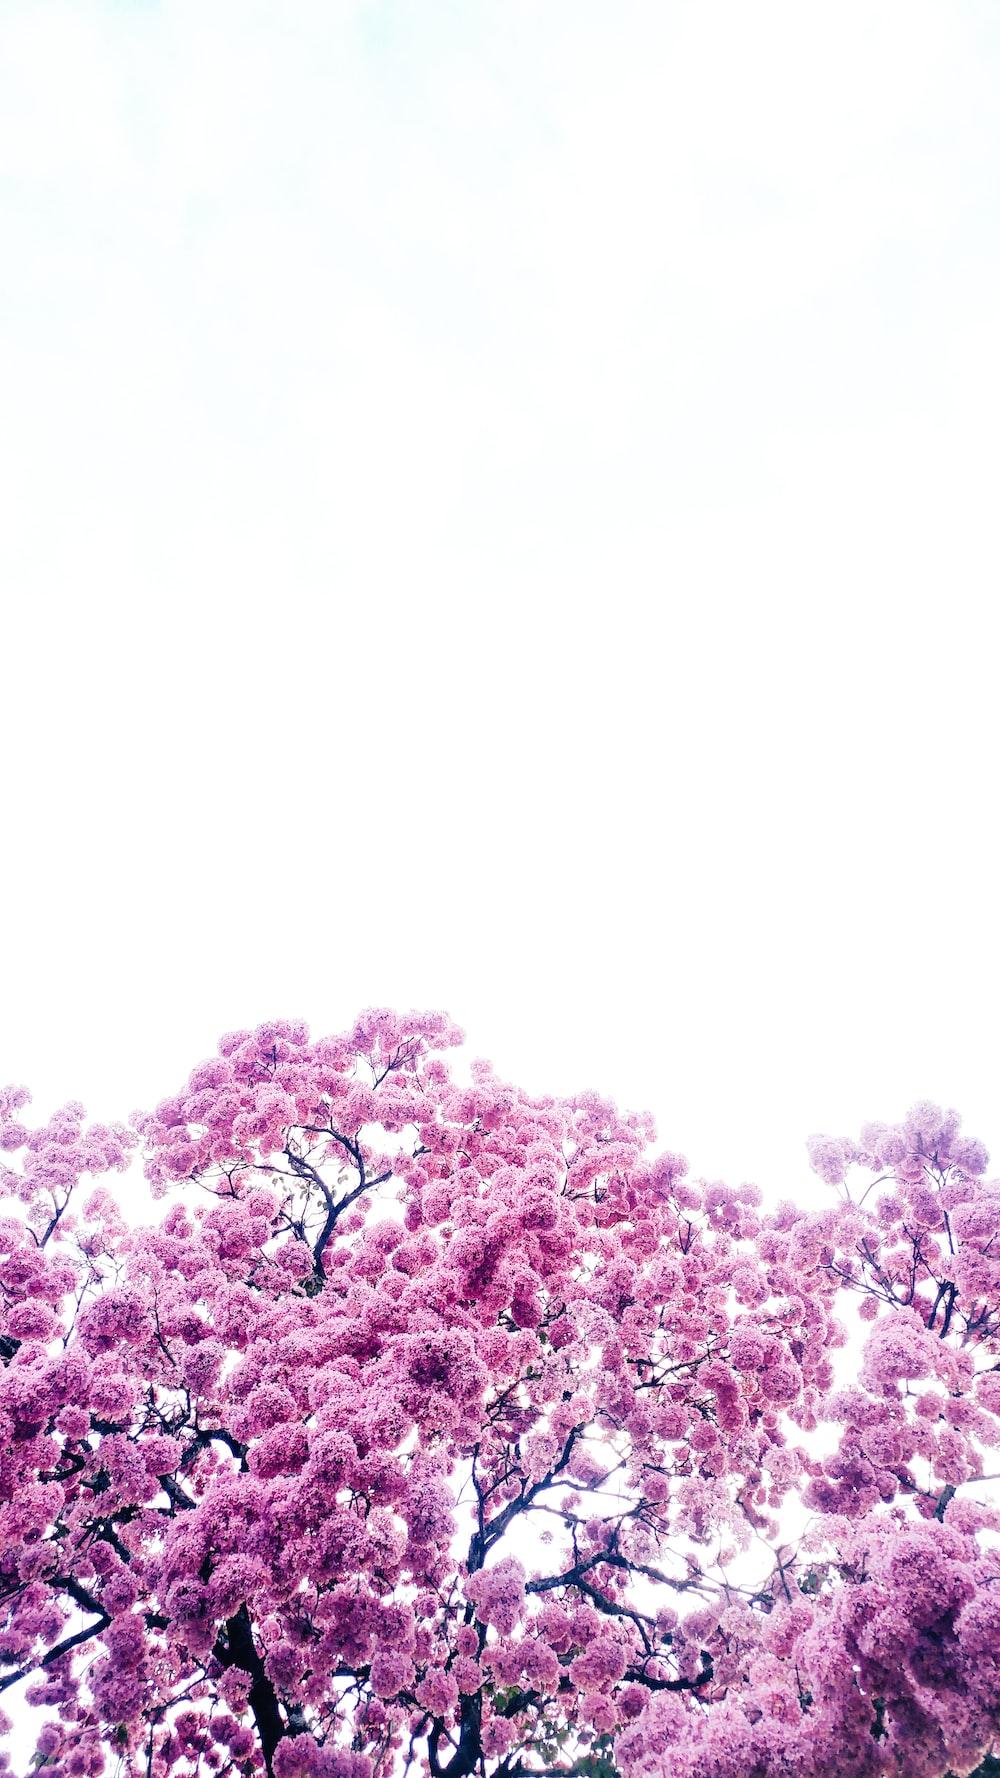 pink leafed trees